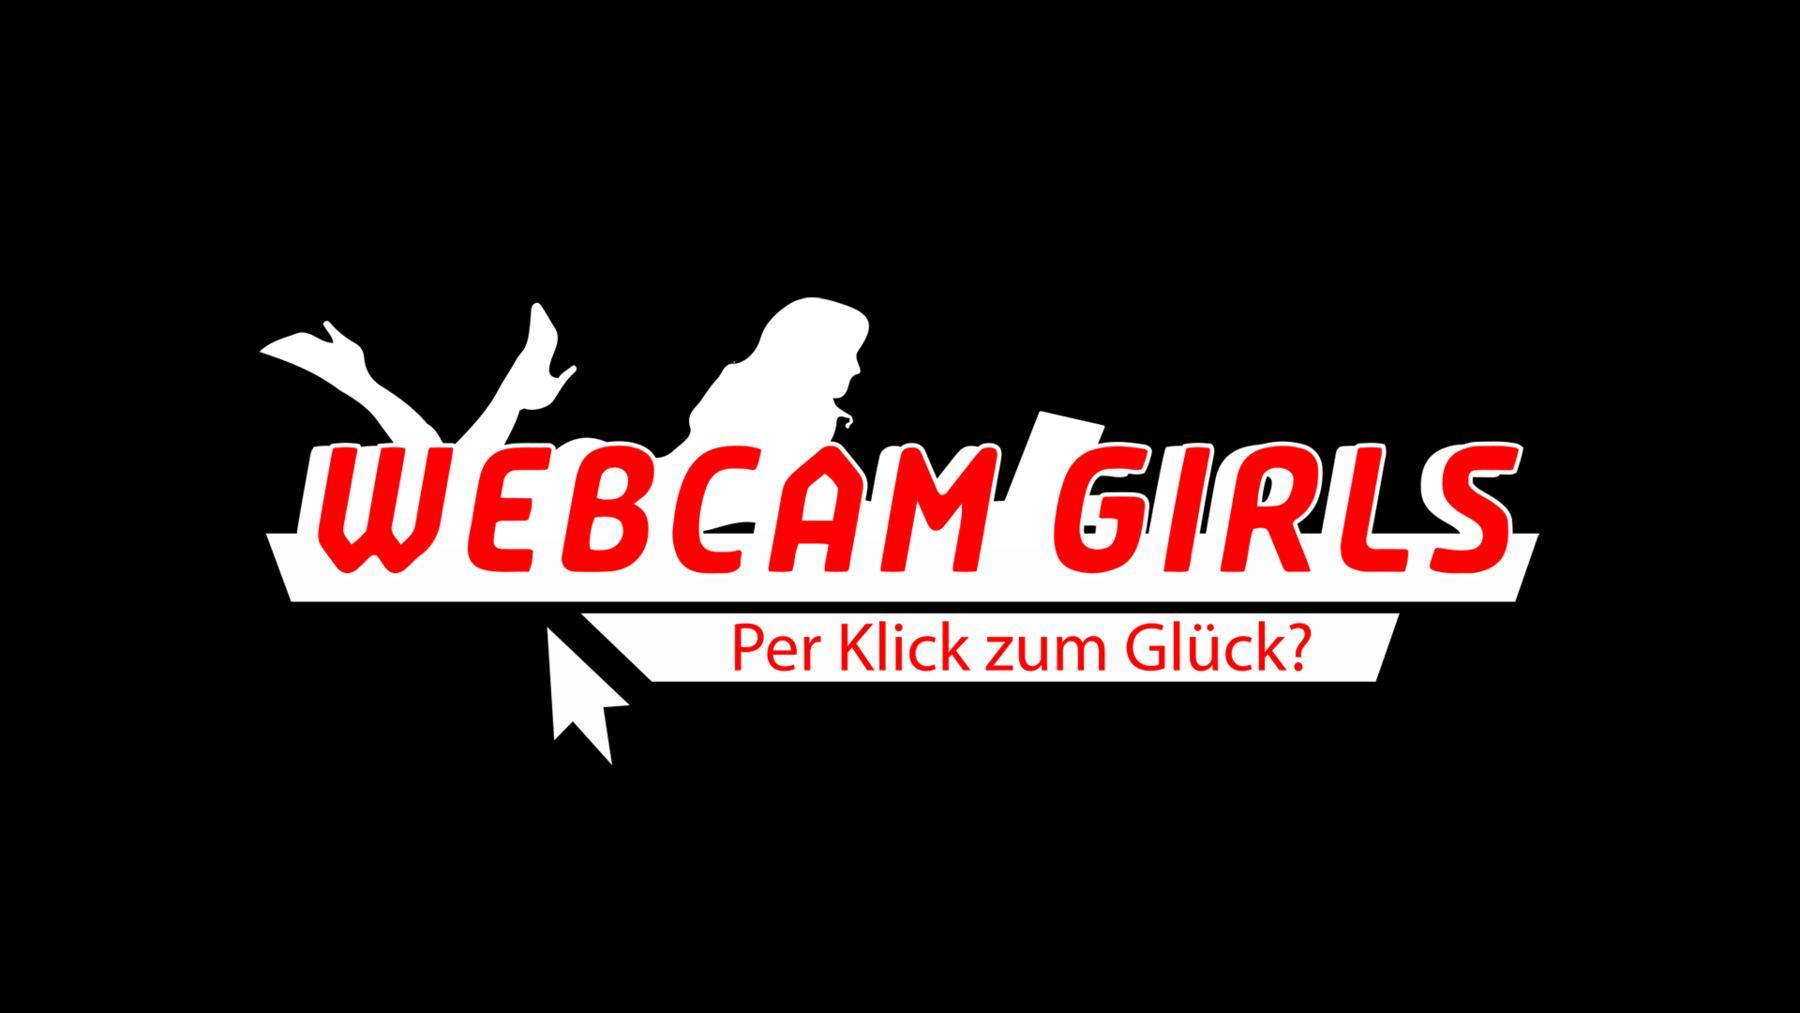 Webcam-Girls - Per Klick zum Glück?